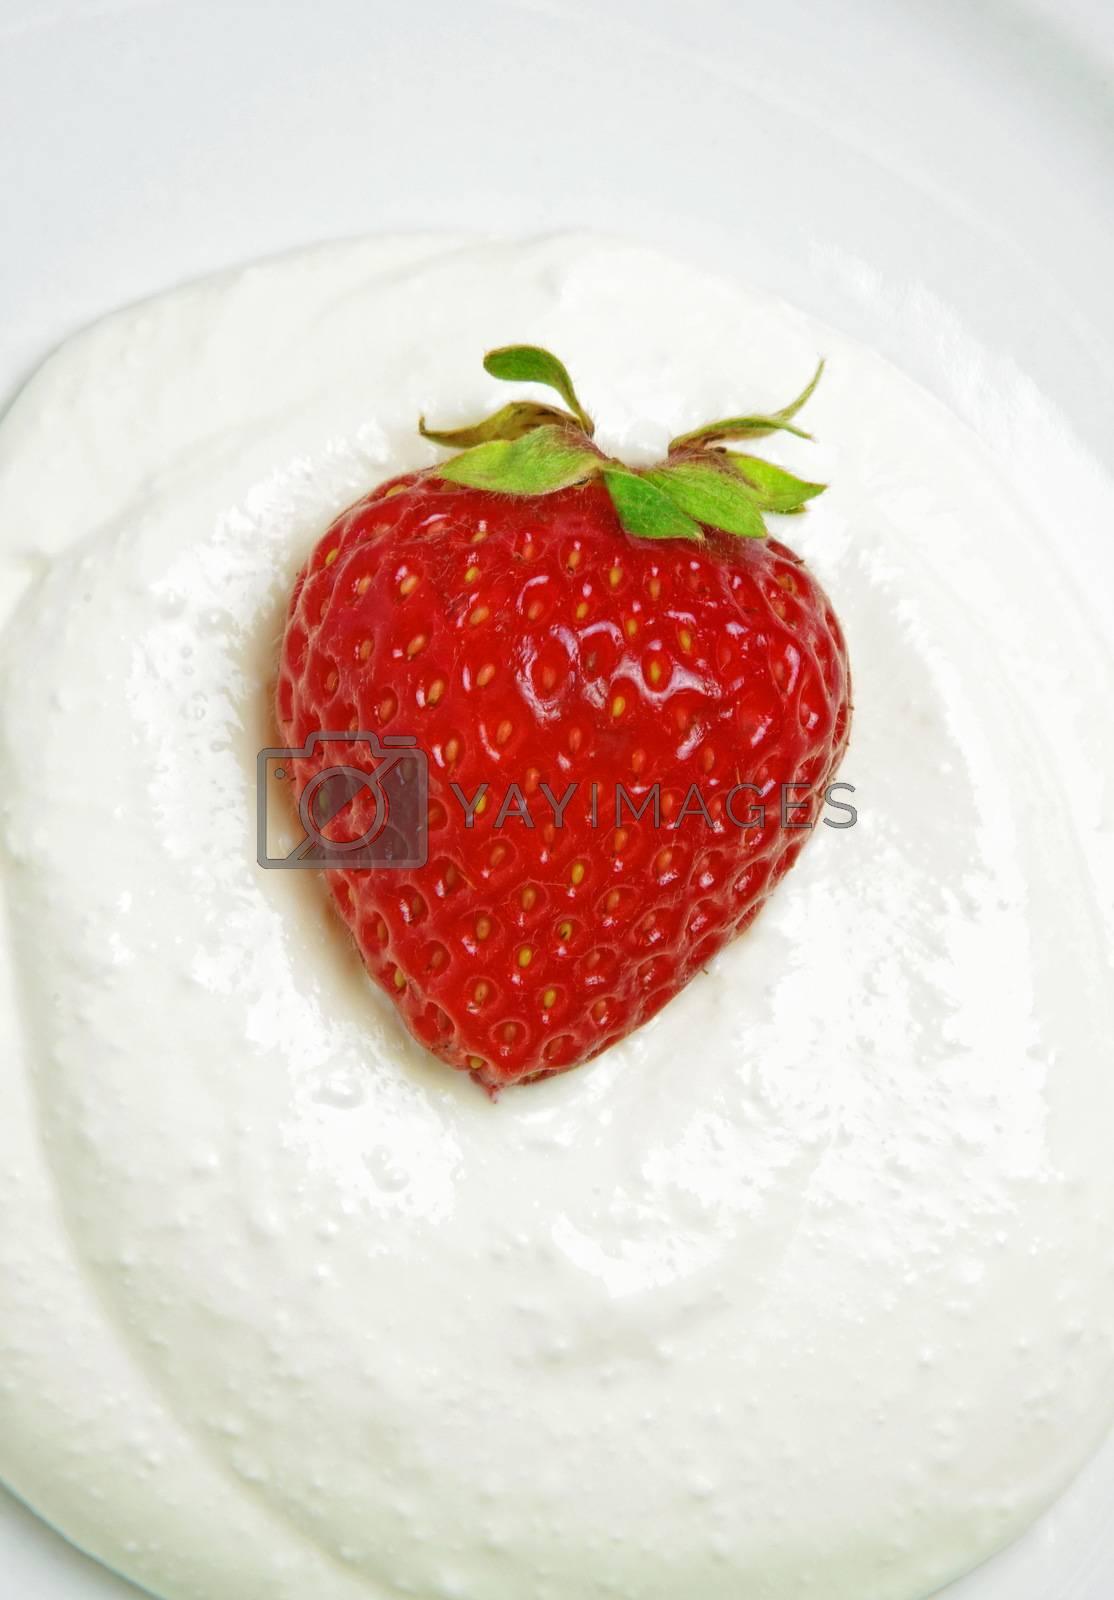 strawberry with cream over white